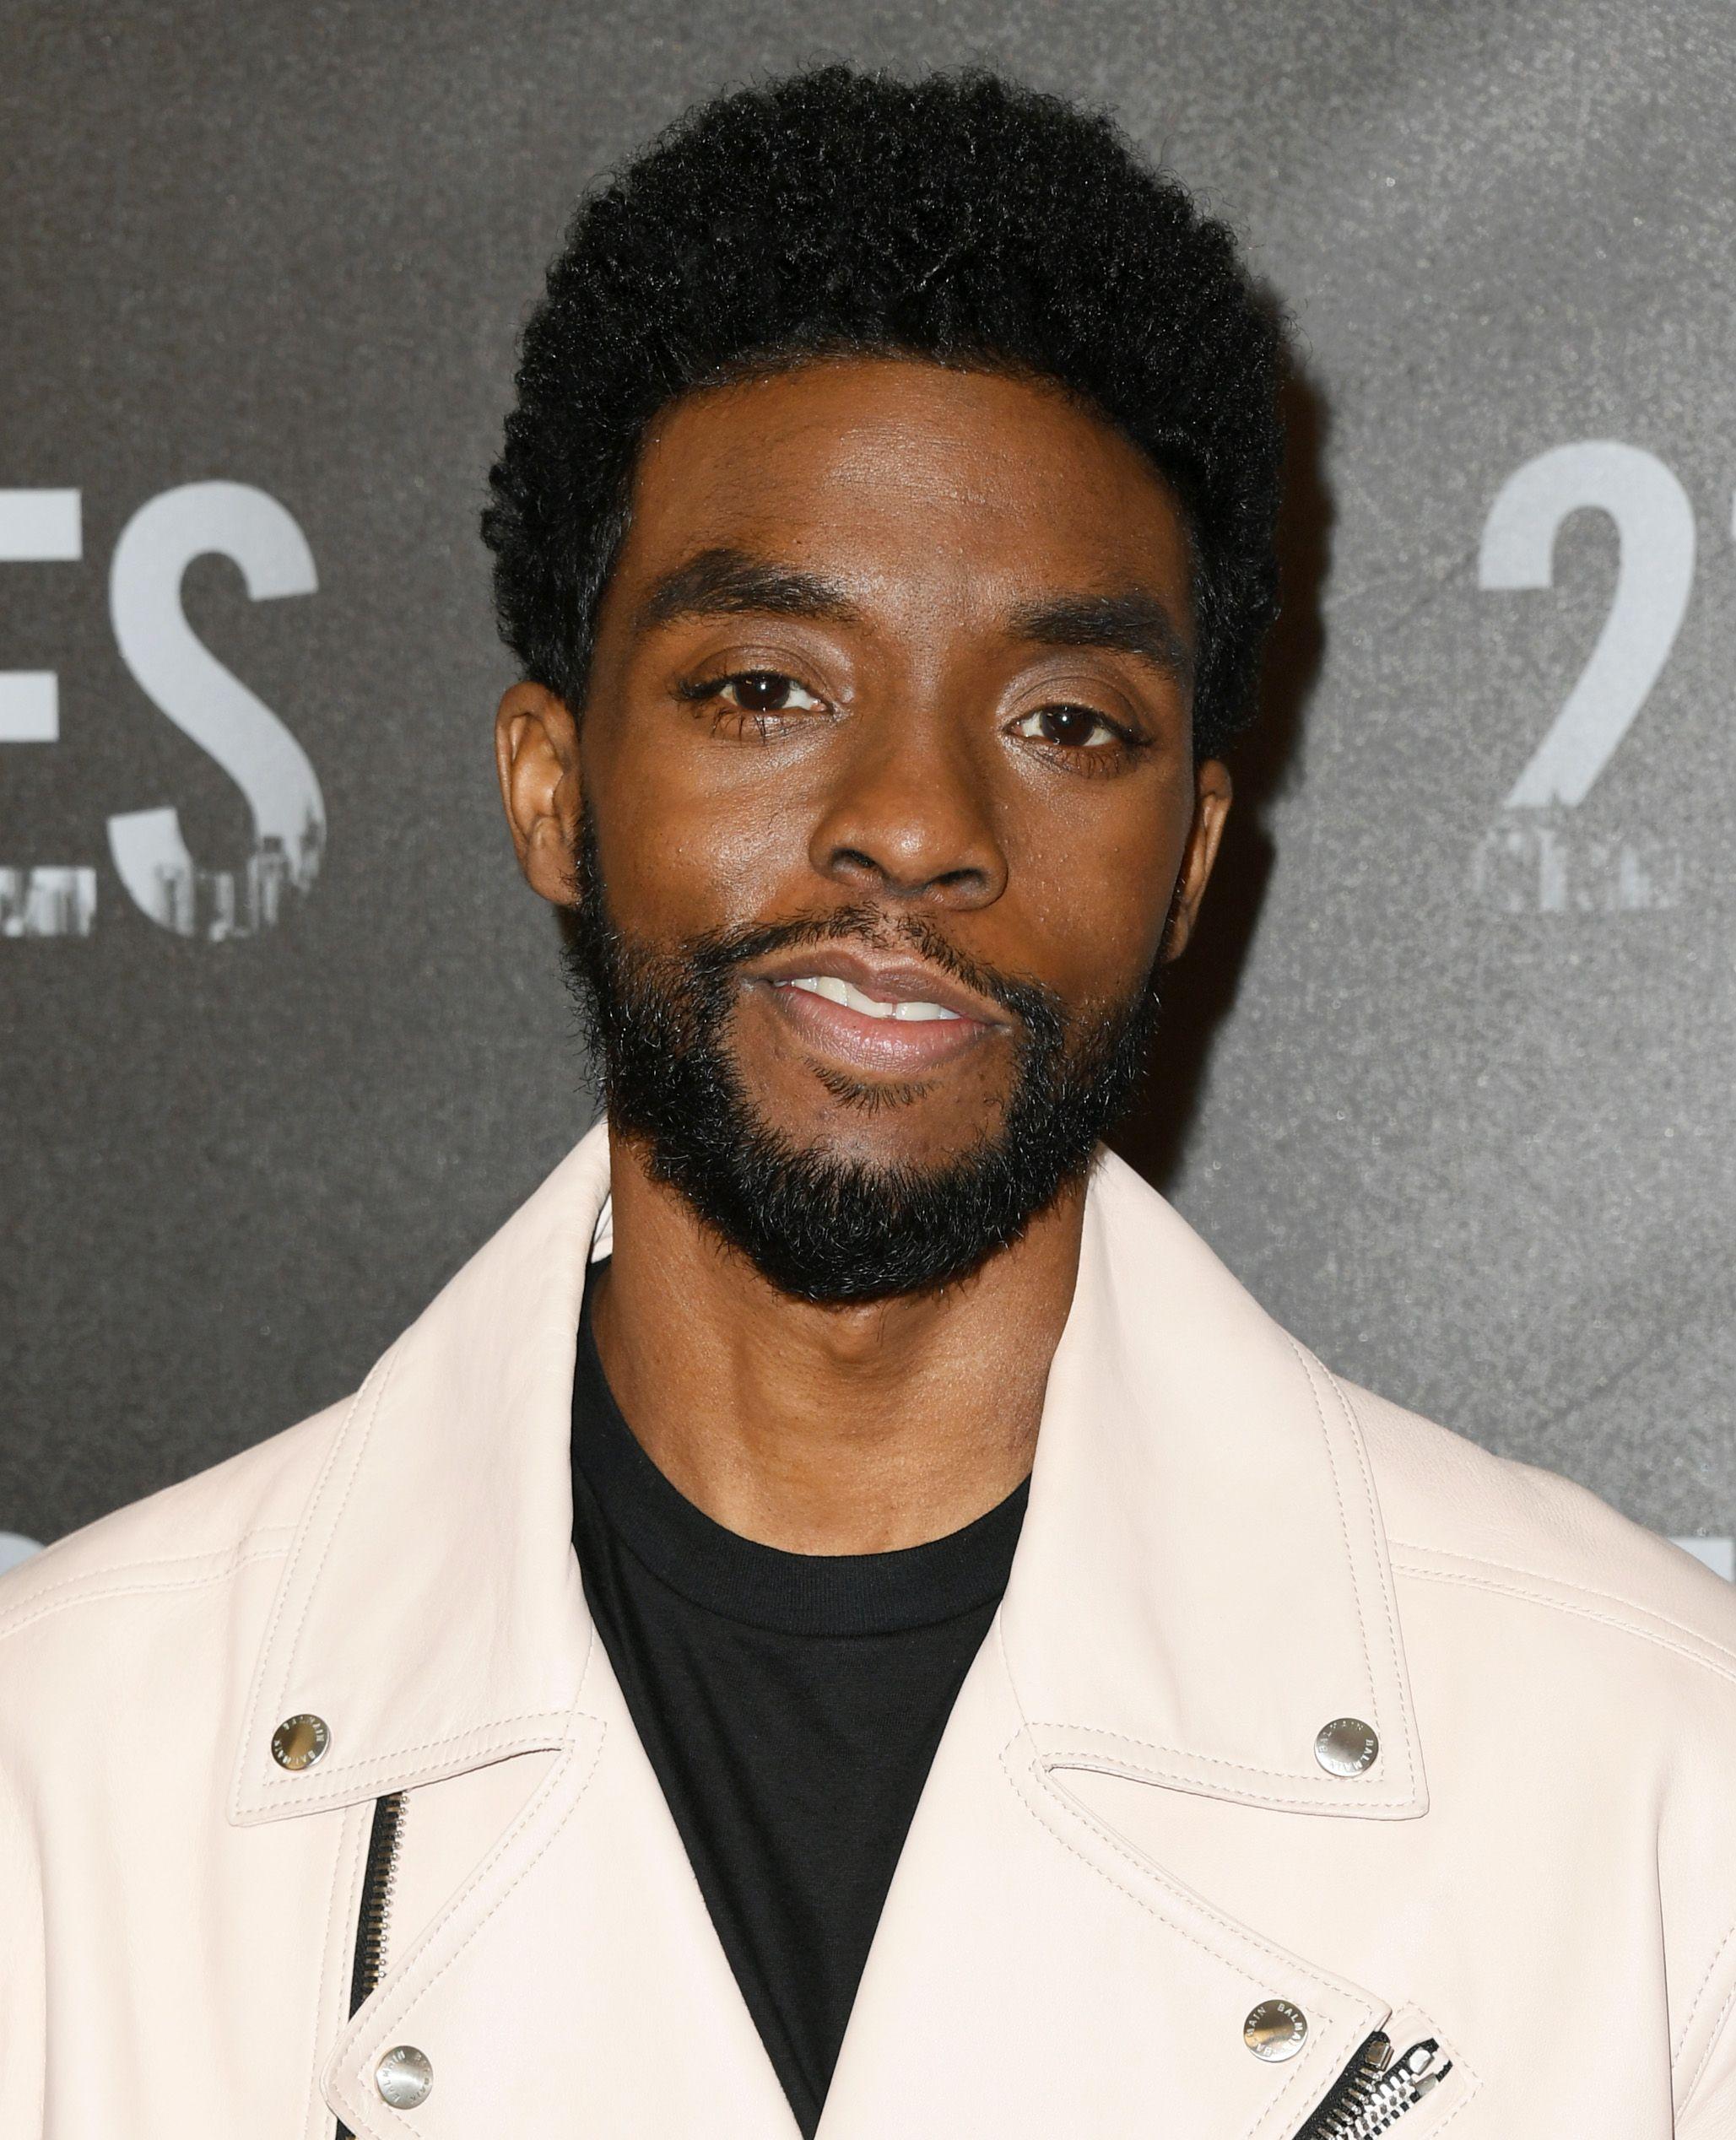 Chadwick Boseman Interview 21 Bridges Black Panther 2 Diversity In Hollywood